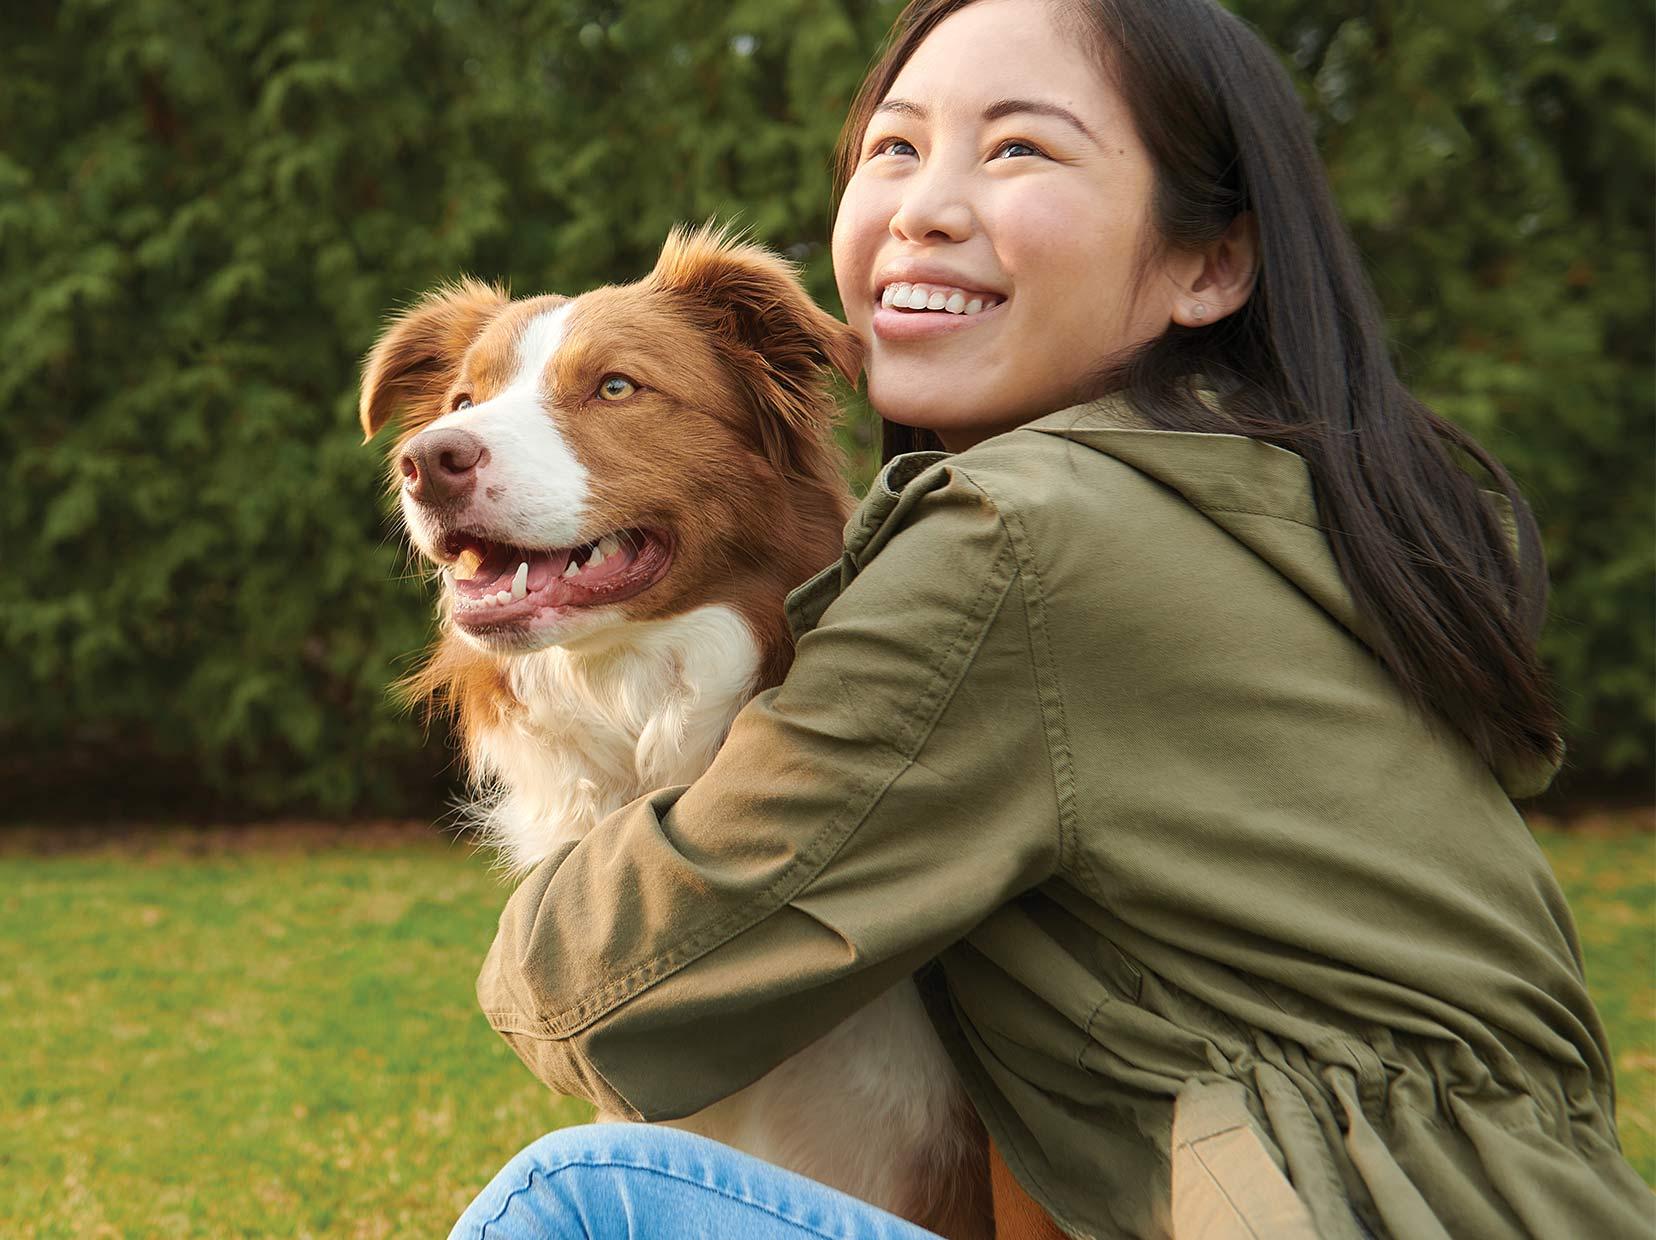 Woman and Dog Embracing